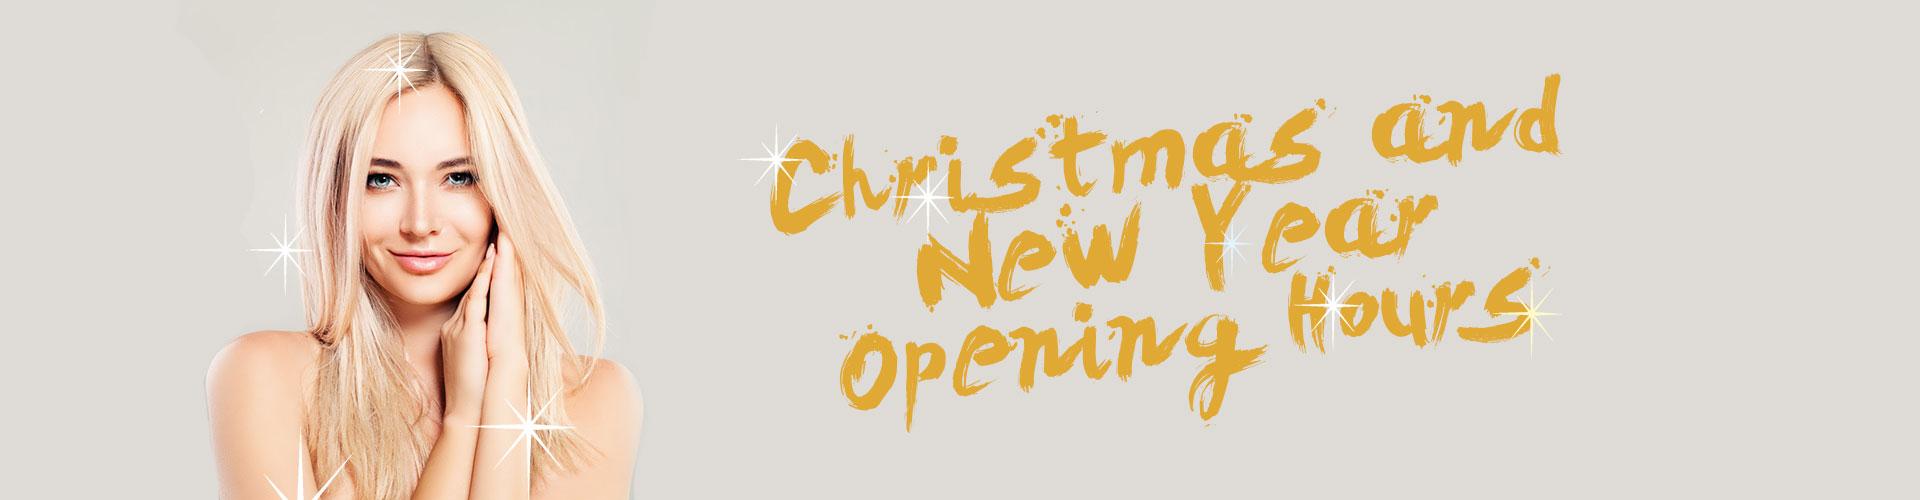 Christmas and New Year Opening Hours, Hair Salon, Milton Keynes, Newport, Blonde Envy Hair Salons